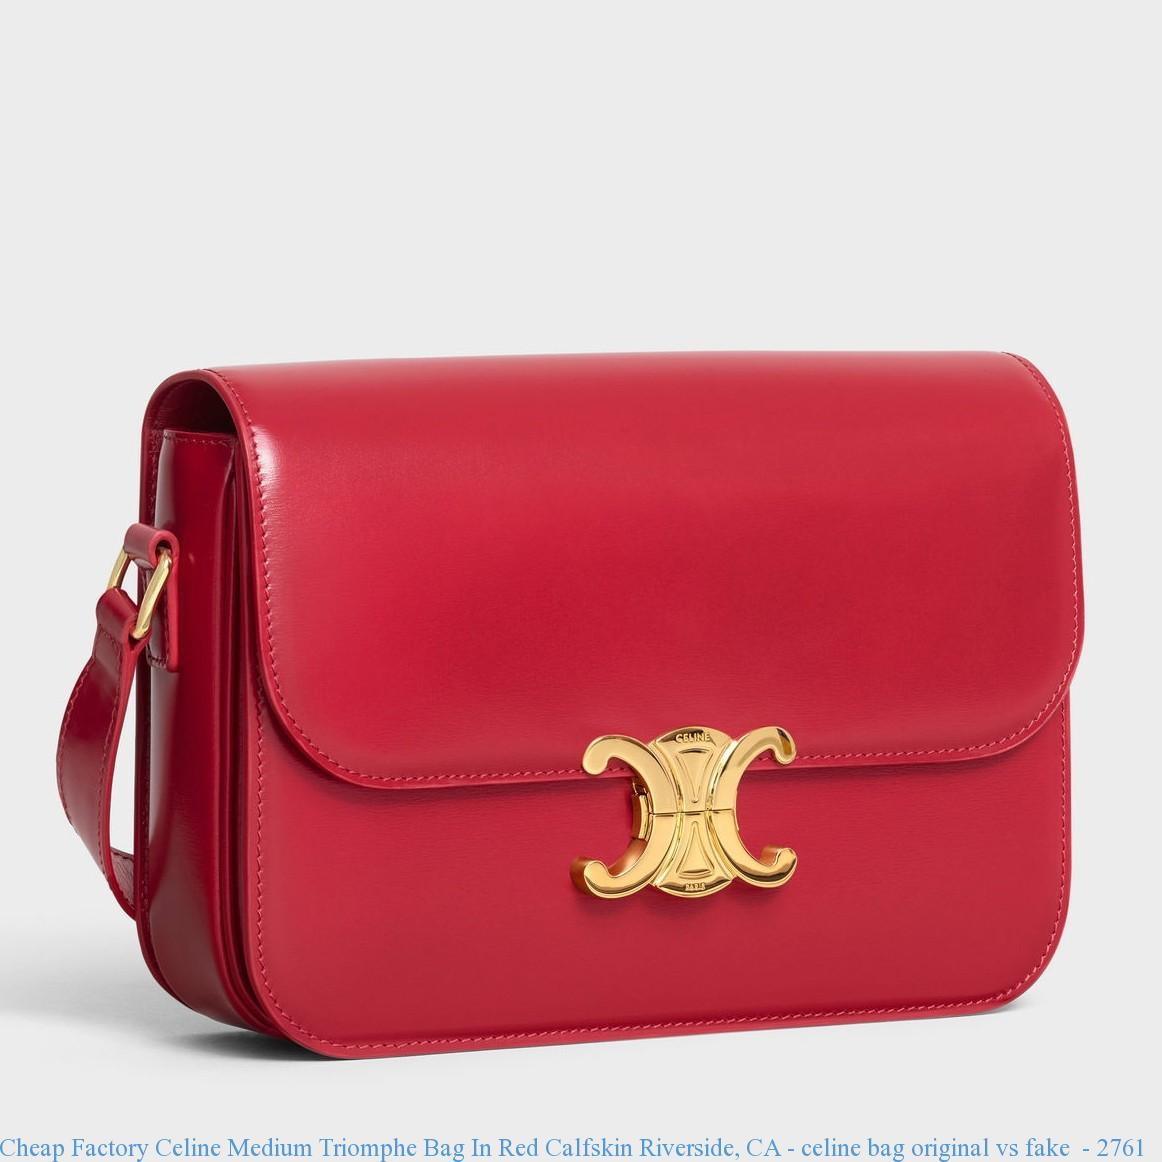 6808db5cfb Cheap Factory Celine Medium Triomphe Bag In Red Calfskin Riverside ...